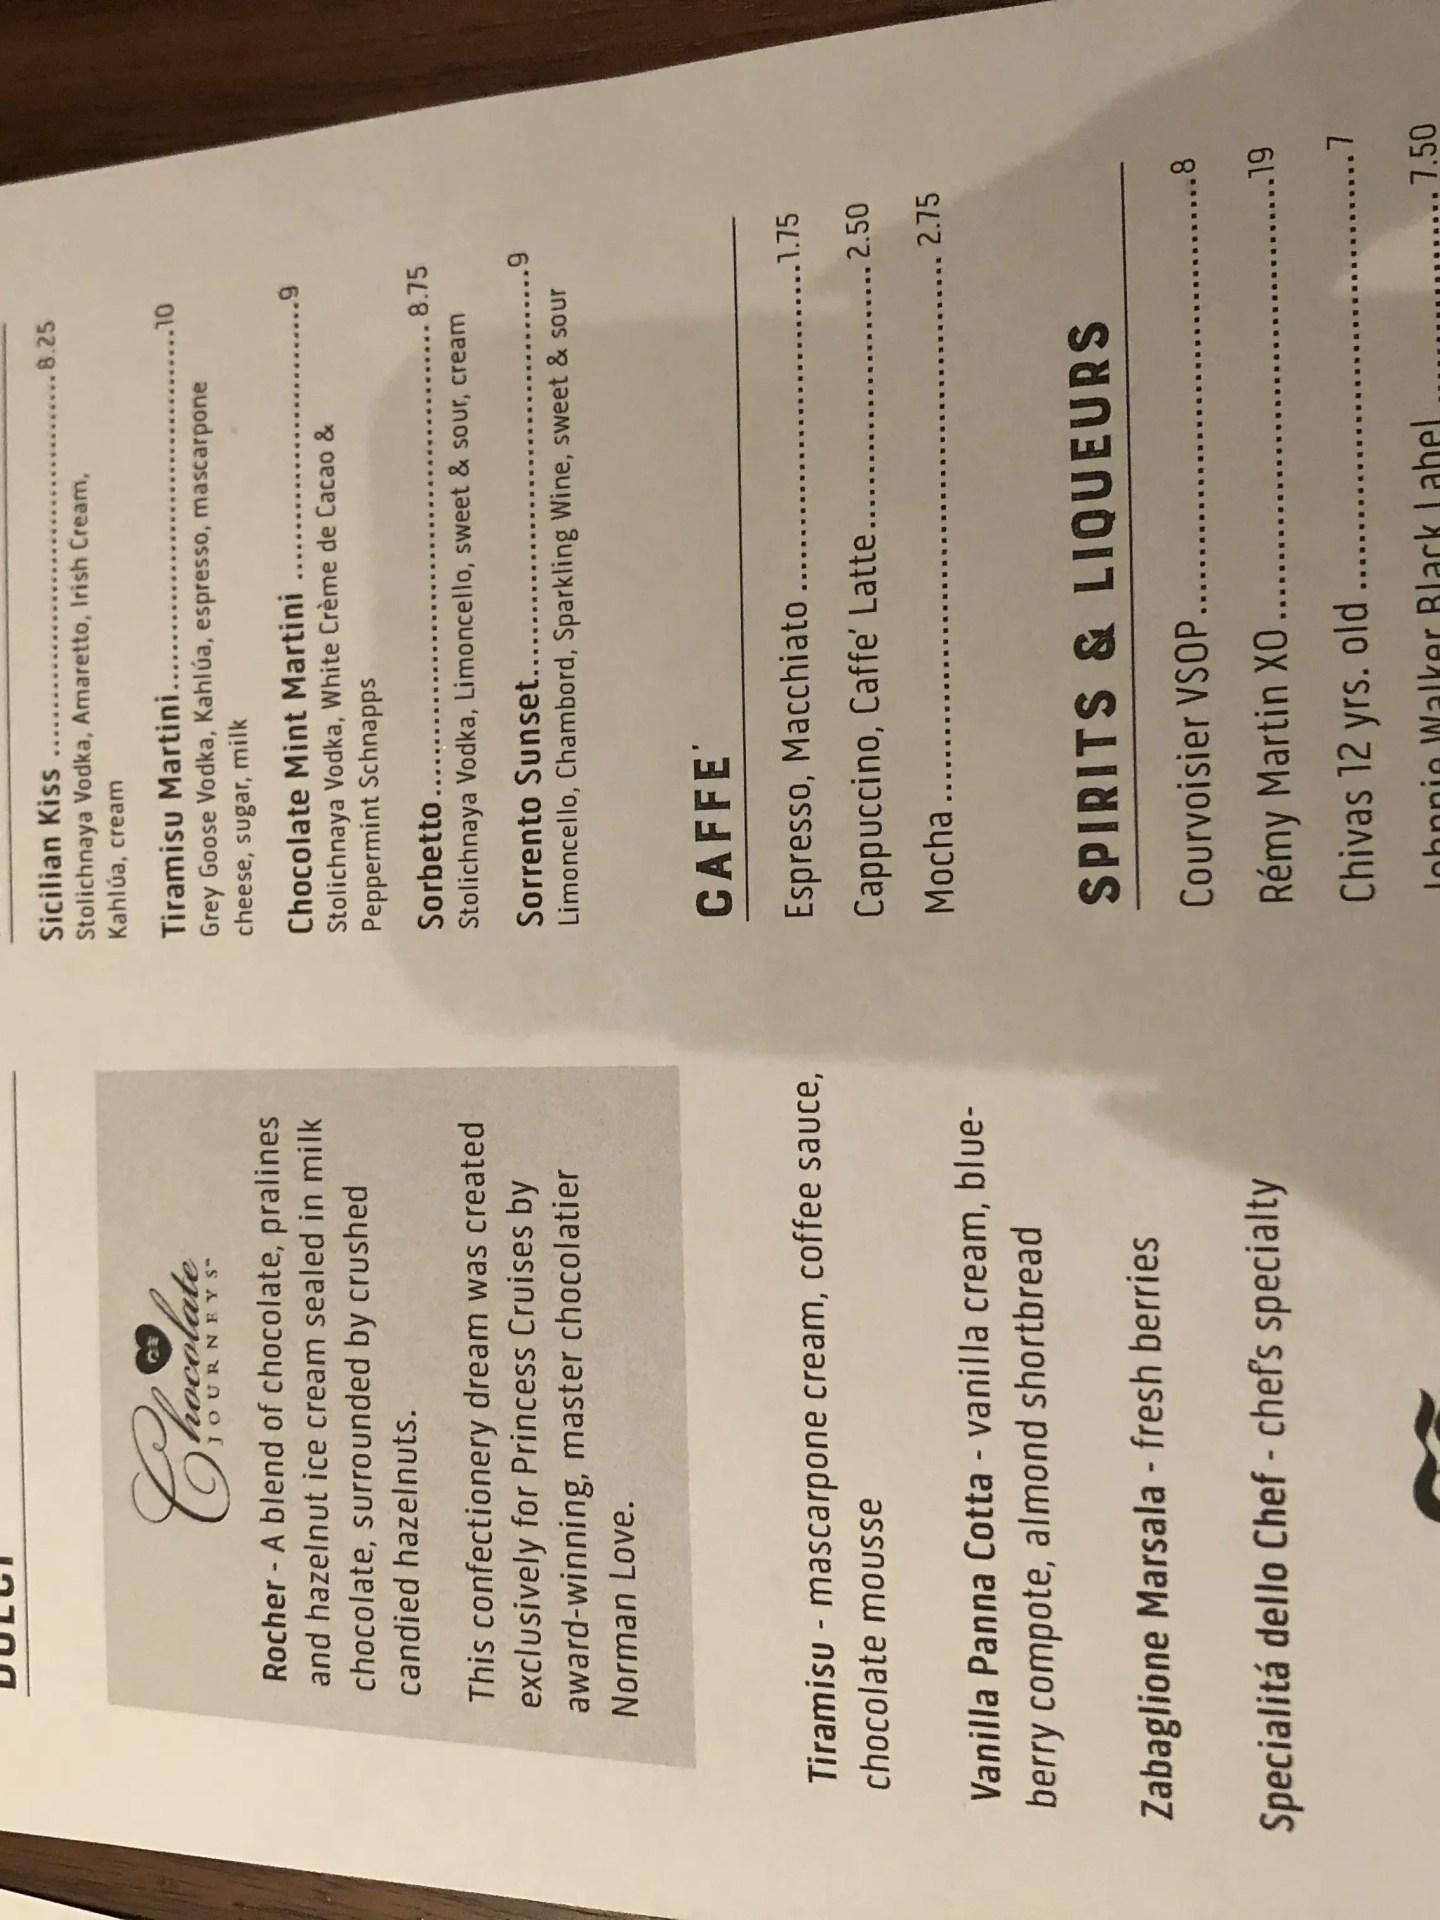 Sabatinis Trattoria menu